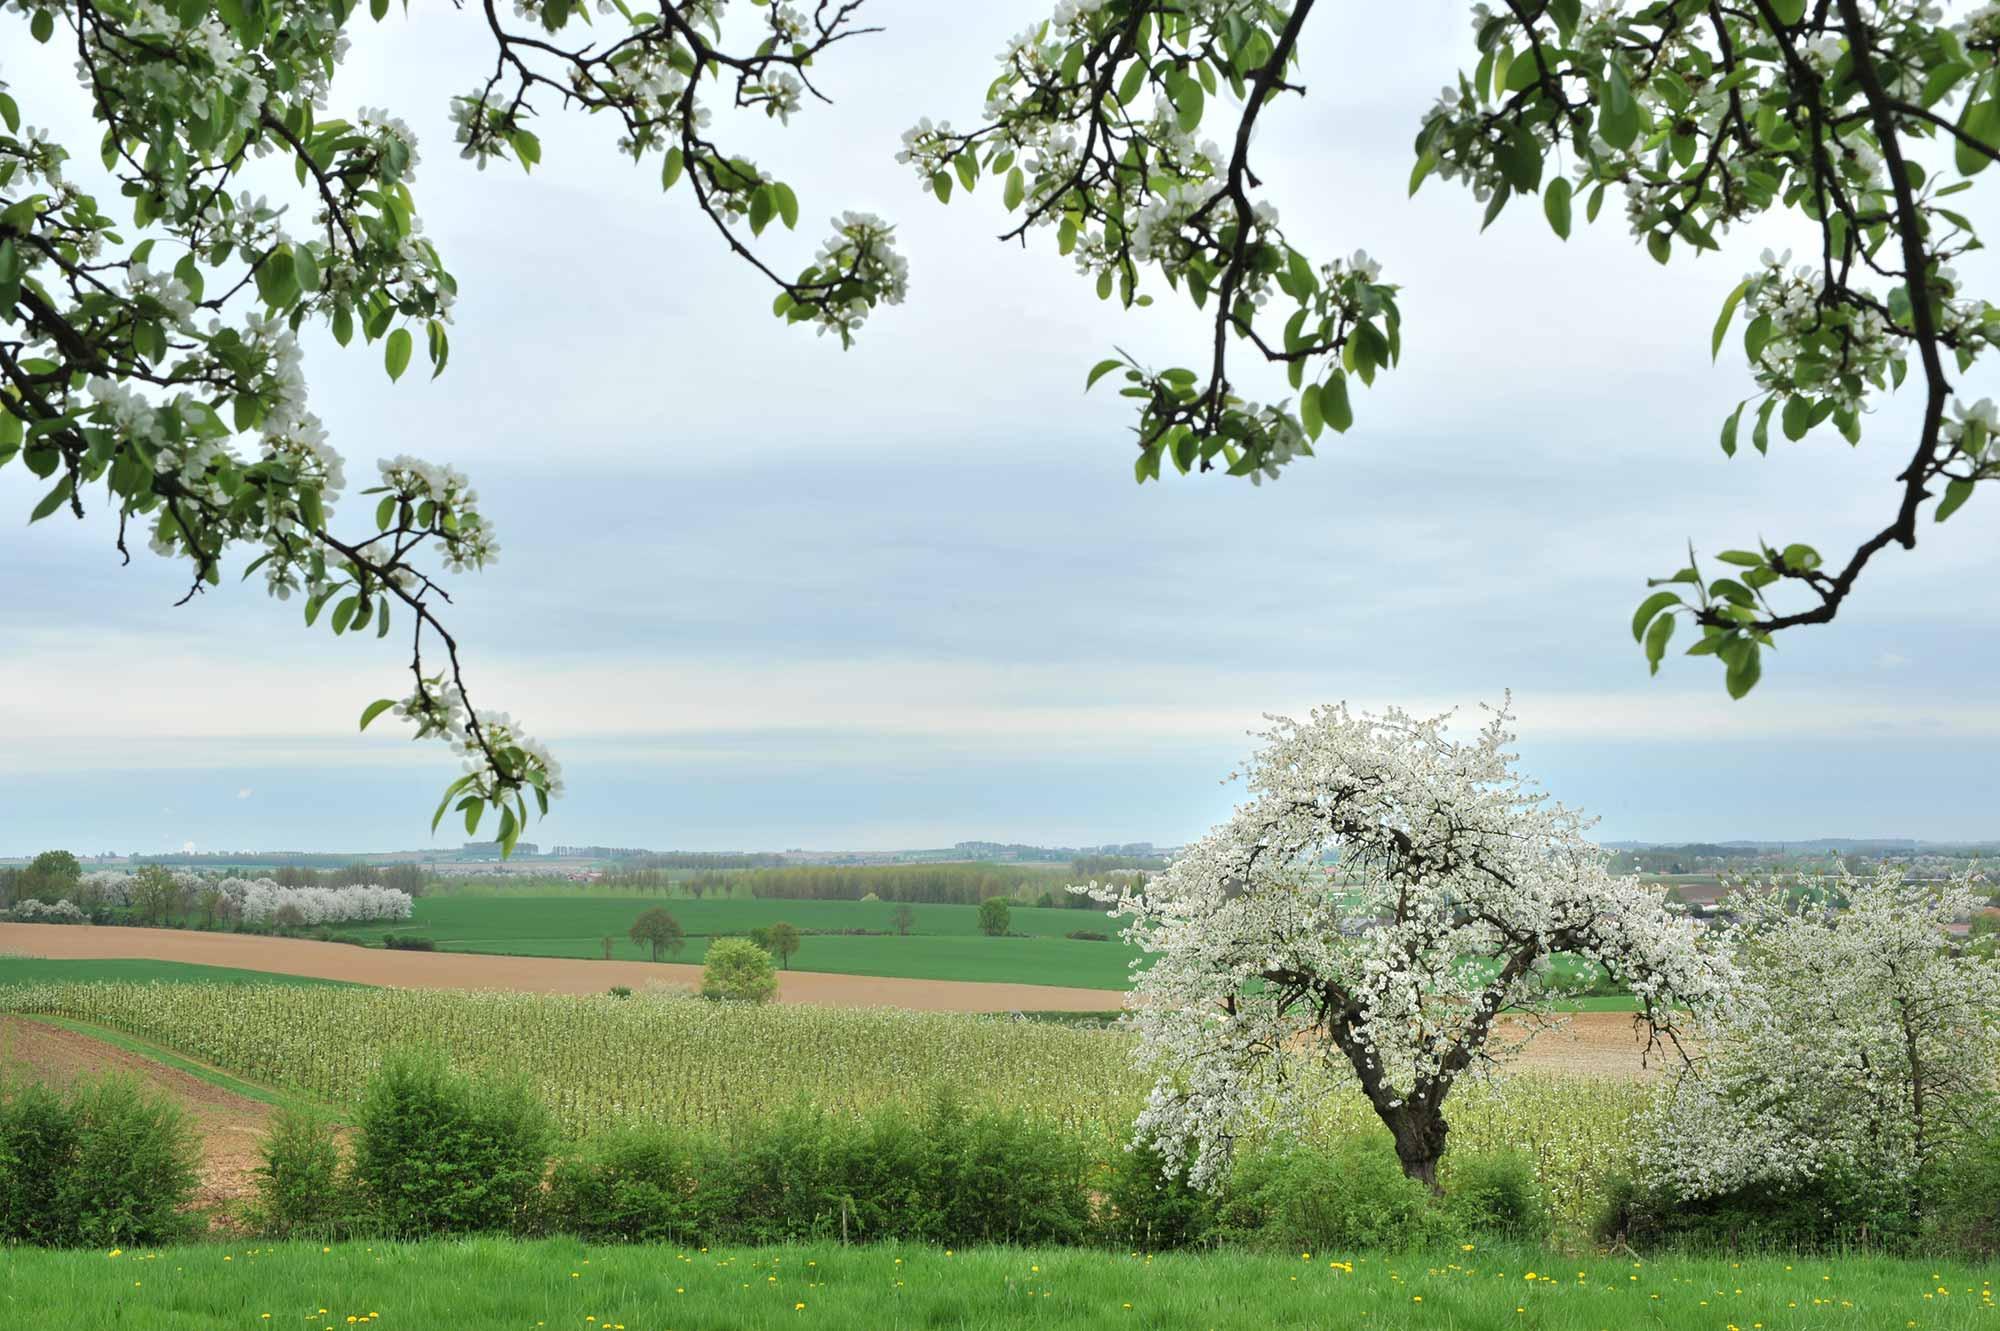 bloesem weide uitzicht natuur